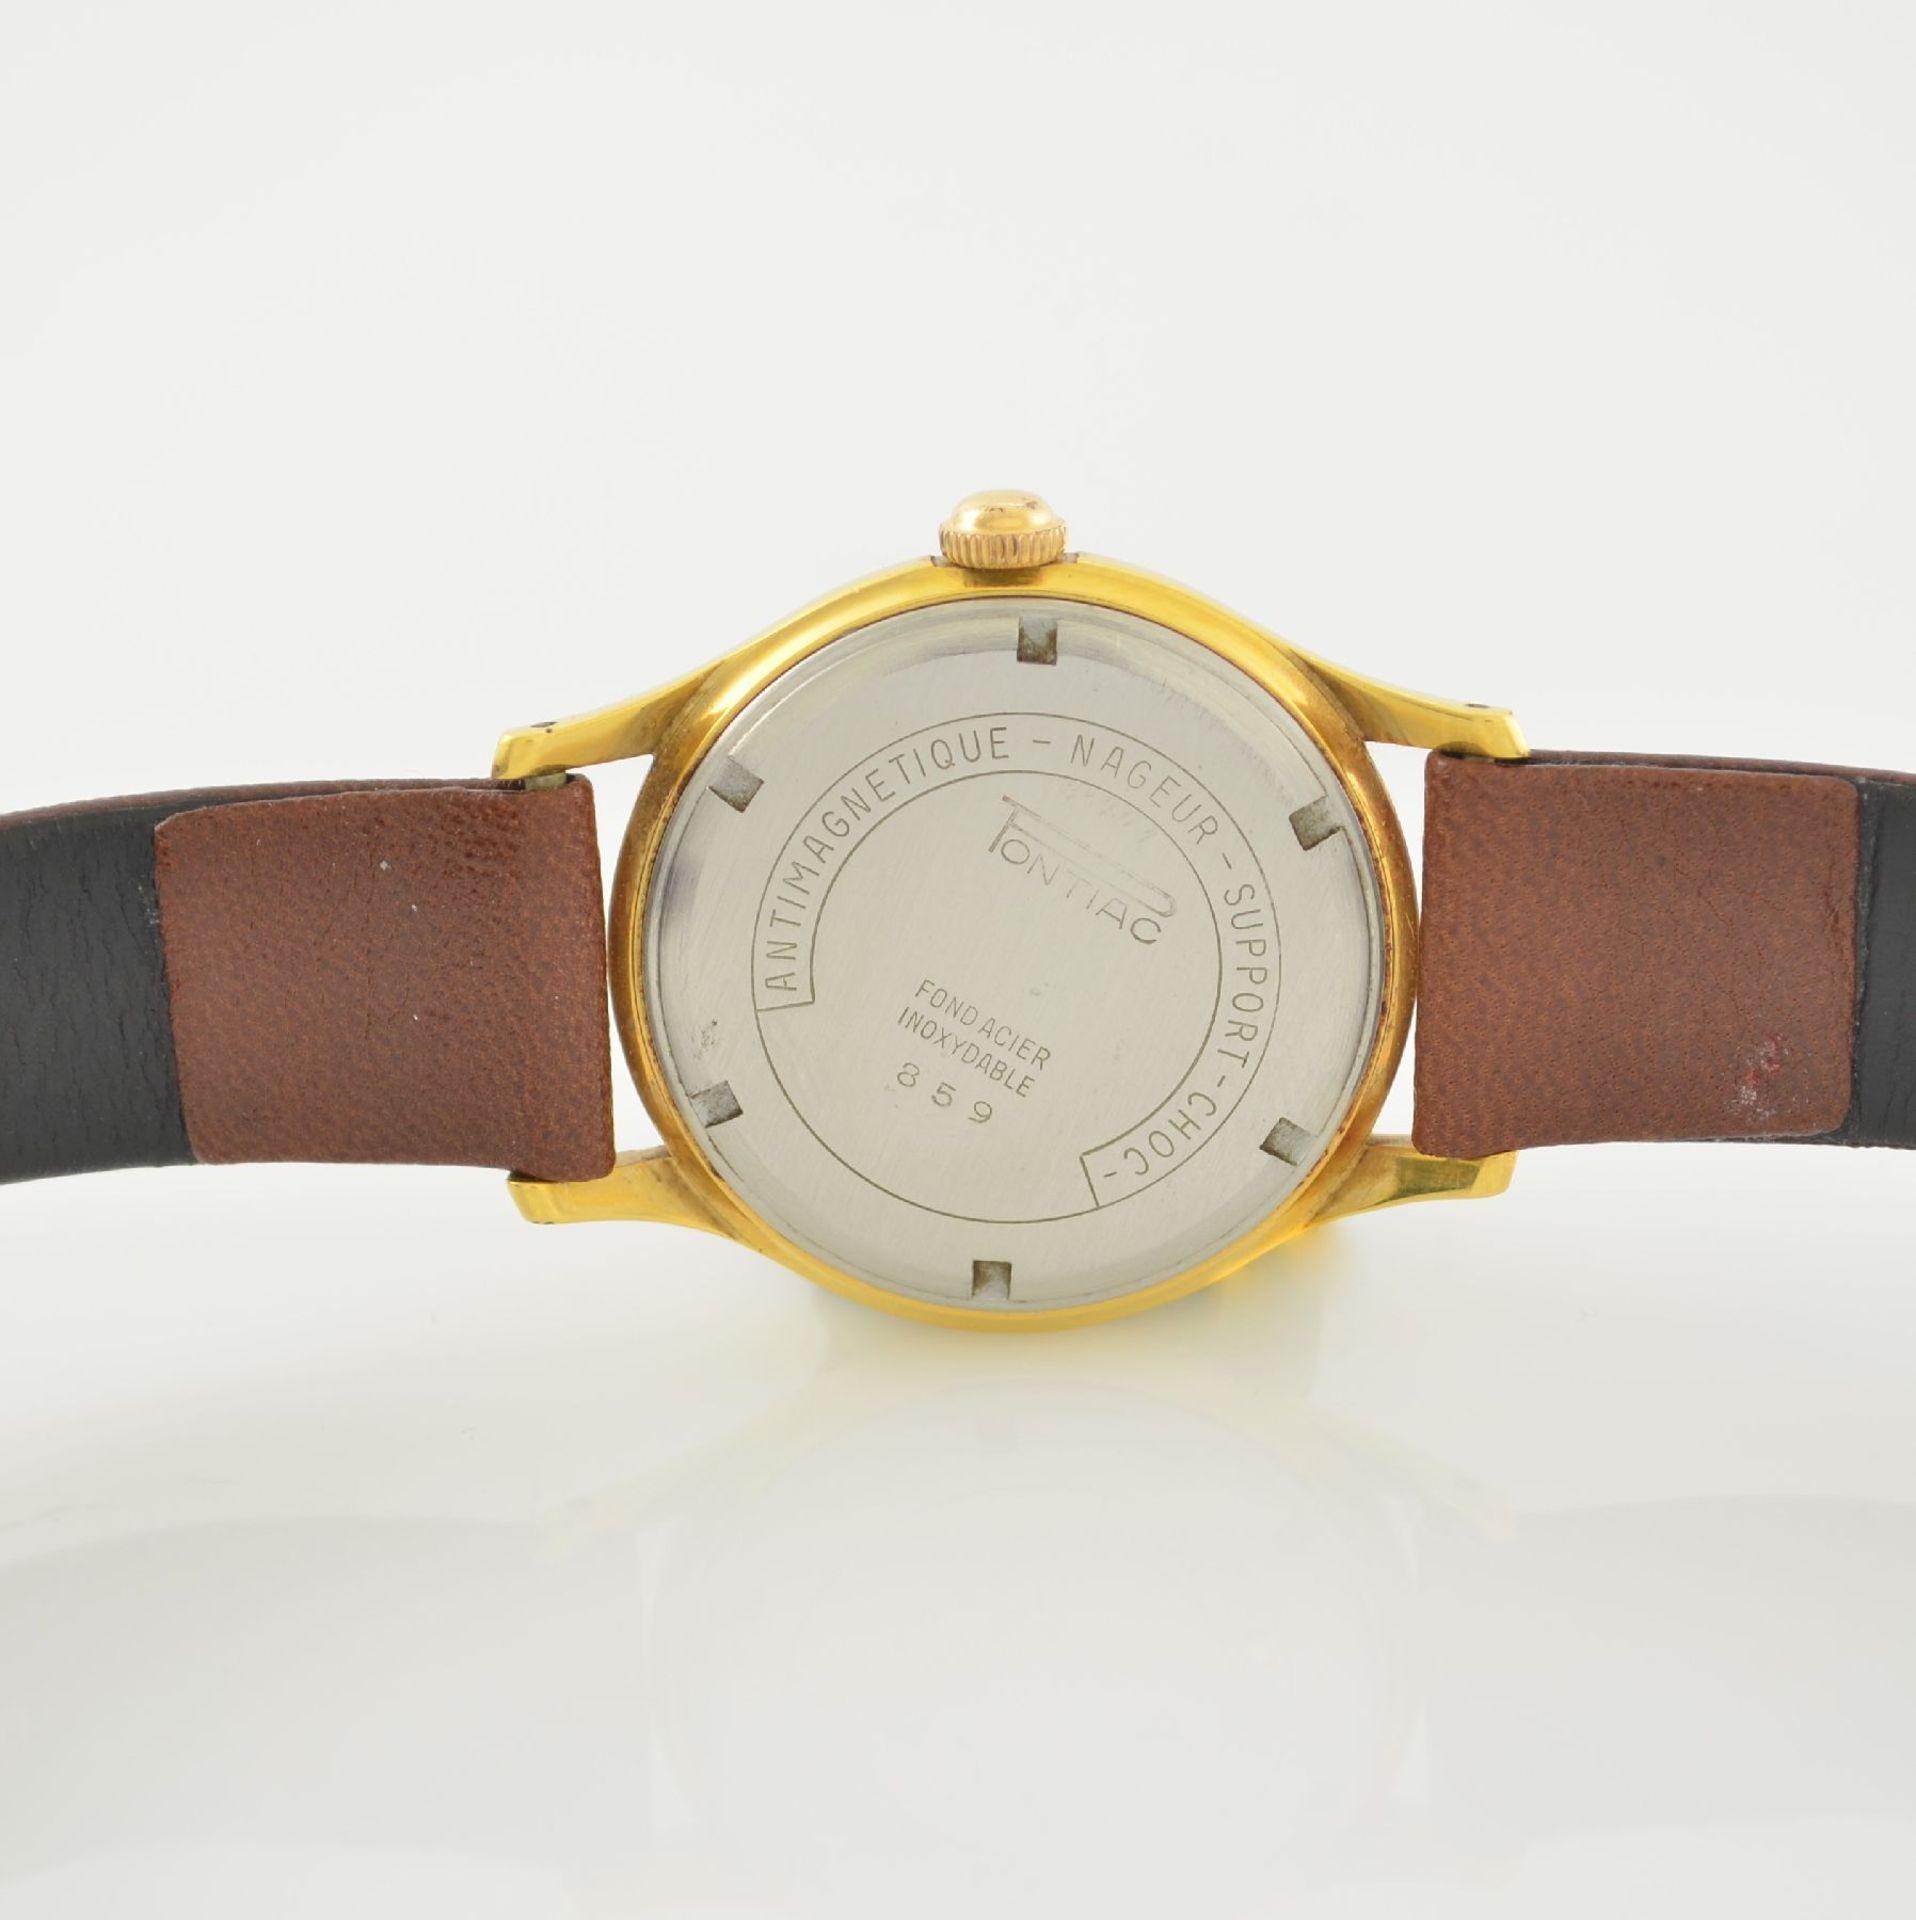 Konvolut: 2 Armbanduhren mit Kalender bzw. Datum, Schweiz um 1950-1960, Handaufzug, 1) NACAR m. - Bild 12 aus 12